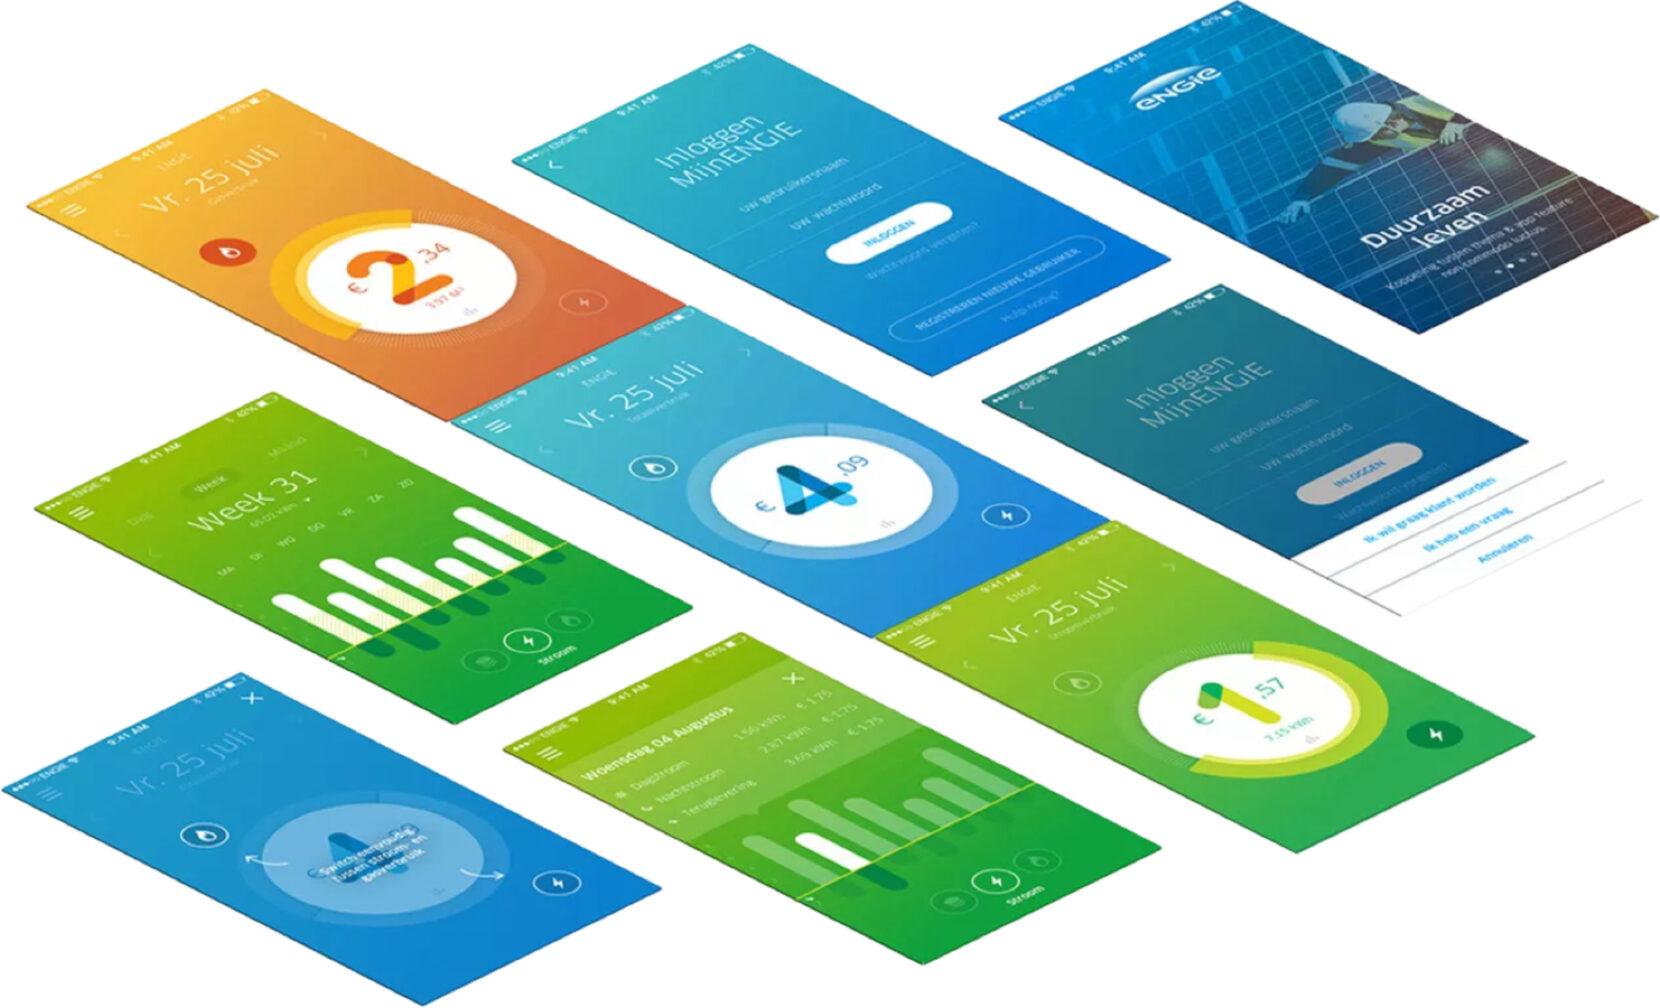 Engie smartphone app 3